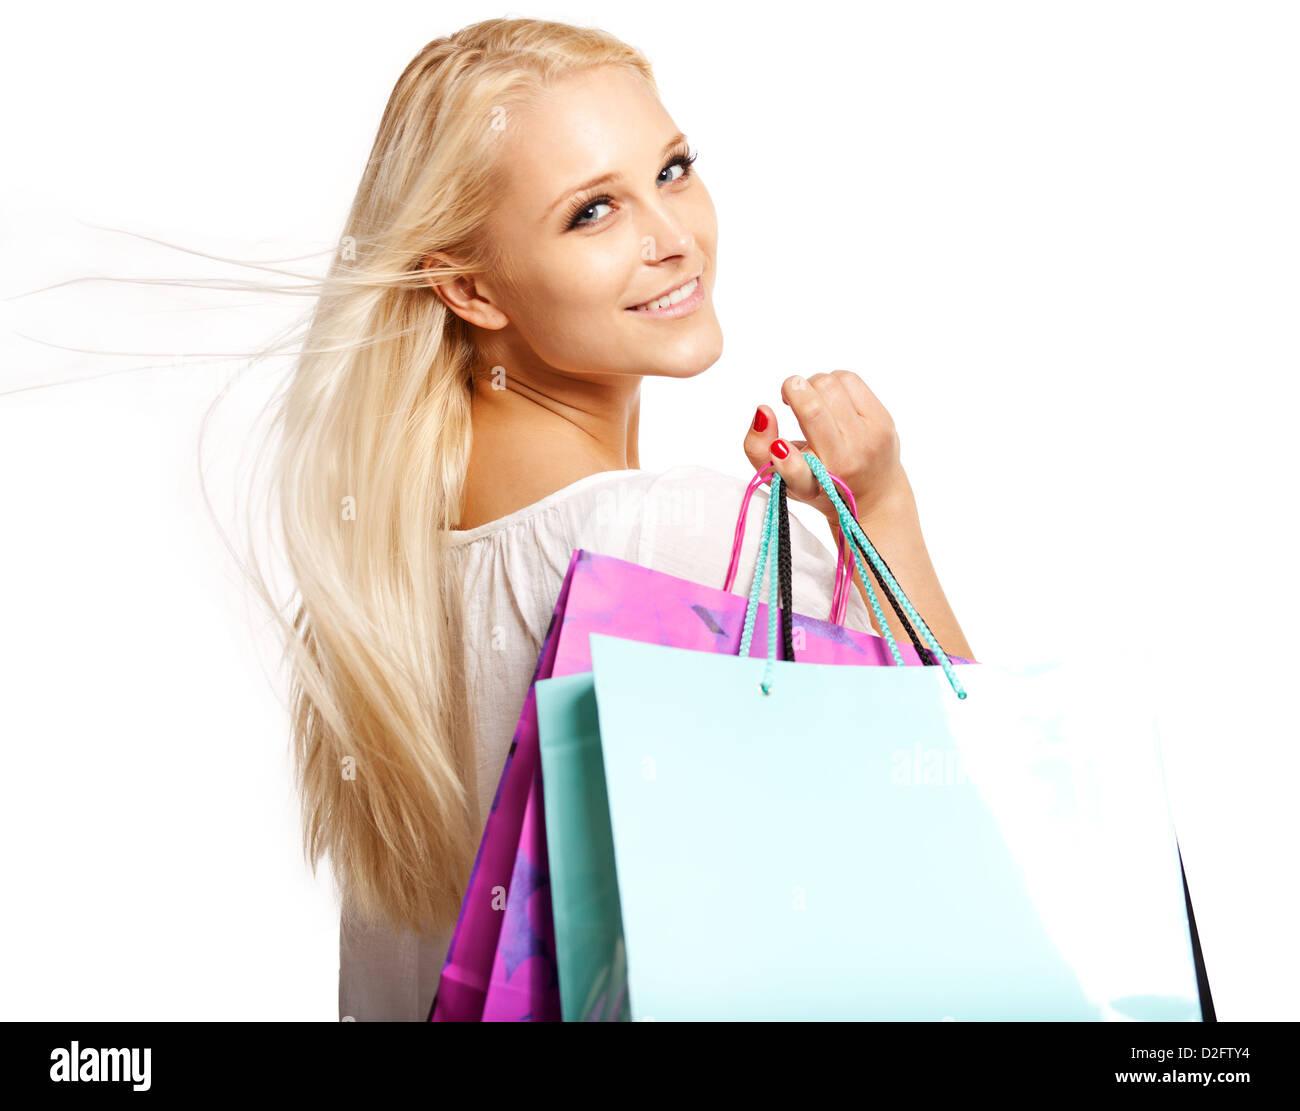 Shopaholic with shopping bags isolated on white background - Stock Image